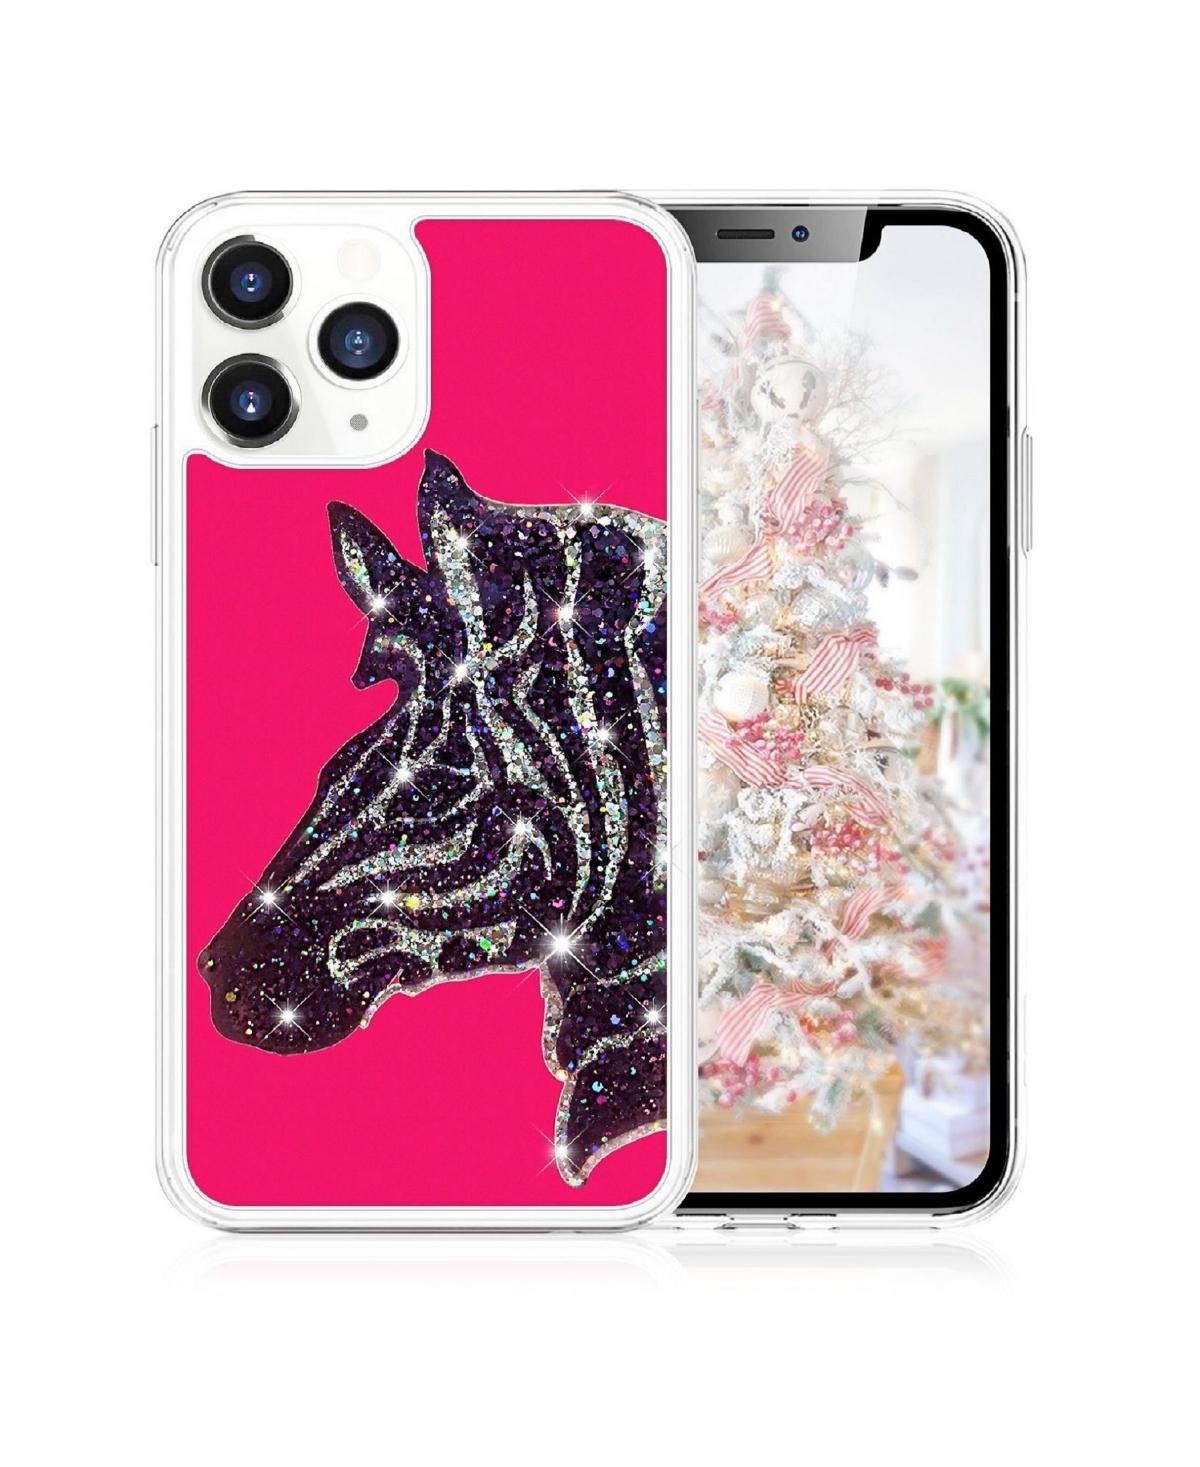 Milanblocks iPhone 11 Pro Zebra Glitter Phone Case